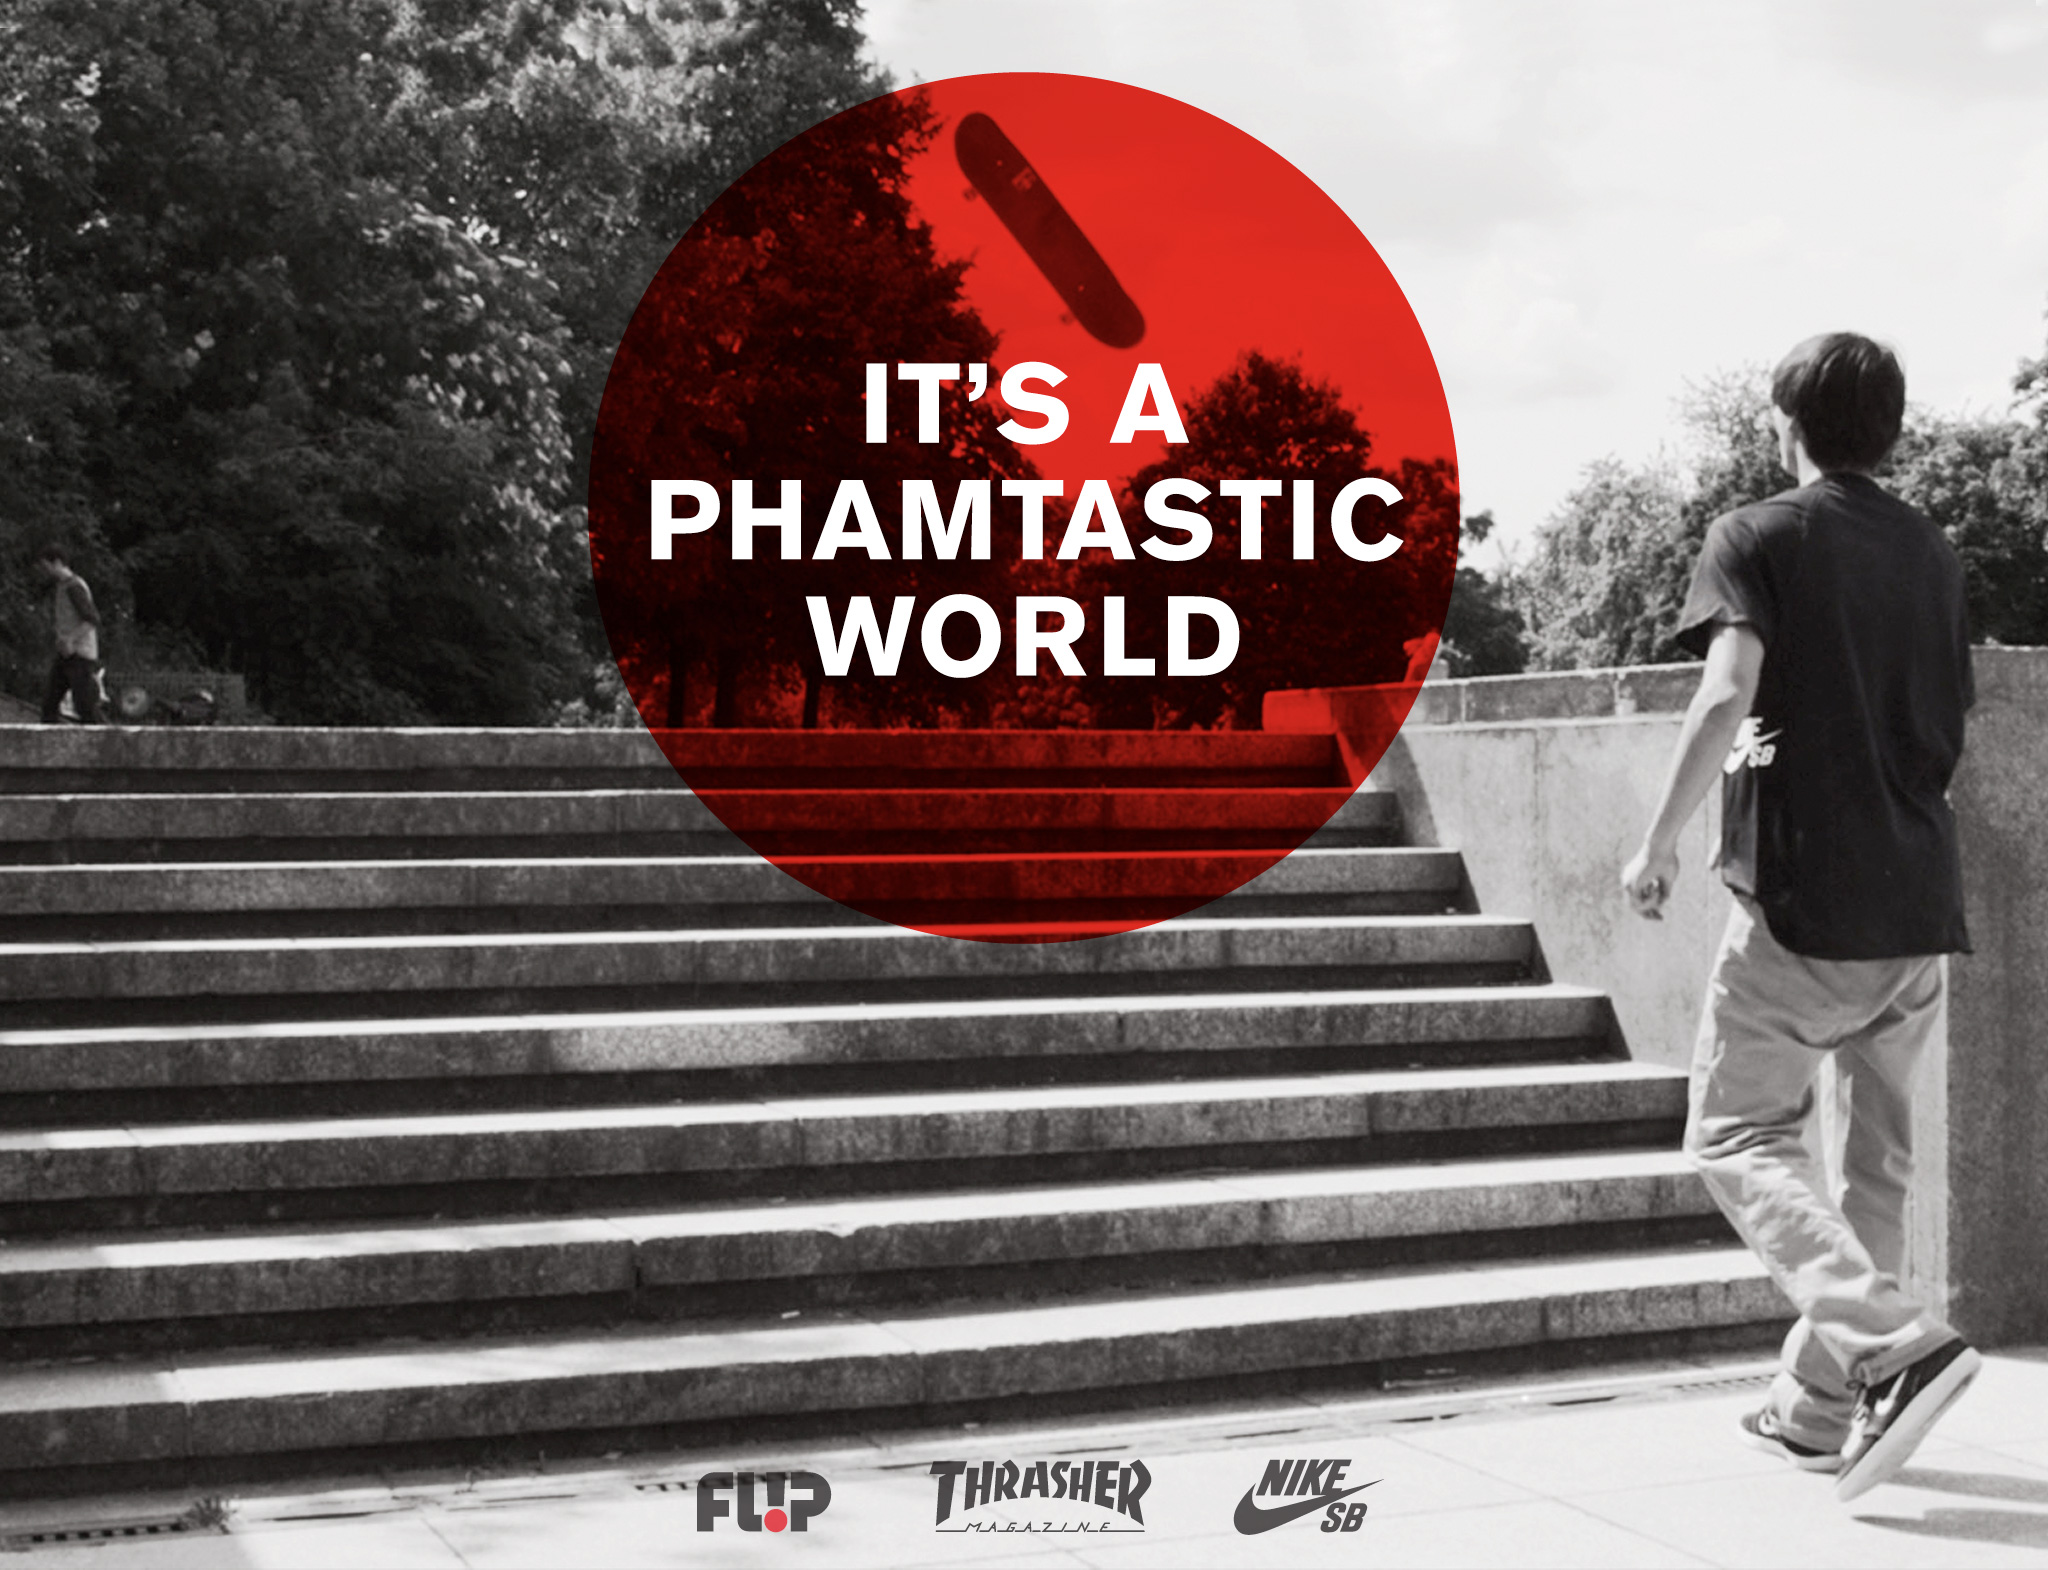 NikeSB_Thrasher-Phamtastic_FBPostImage